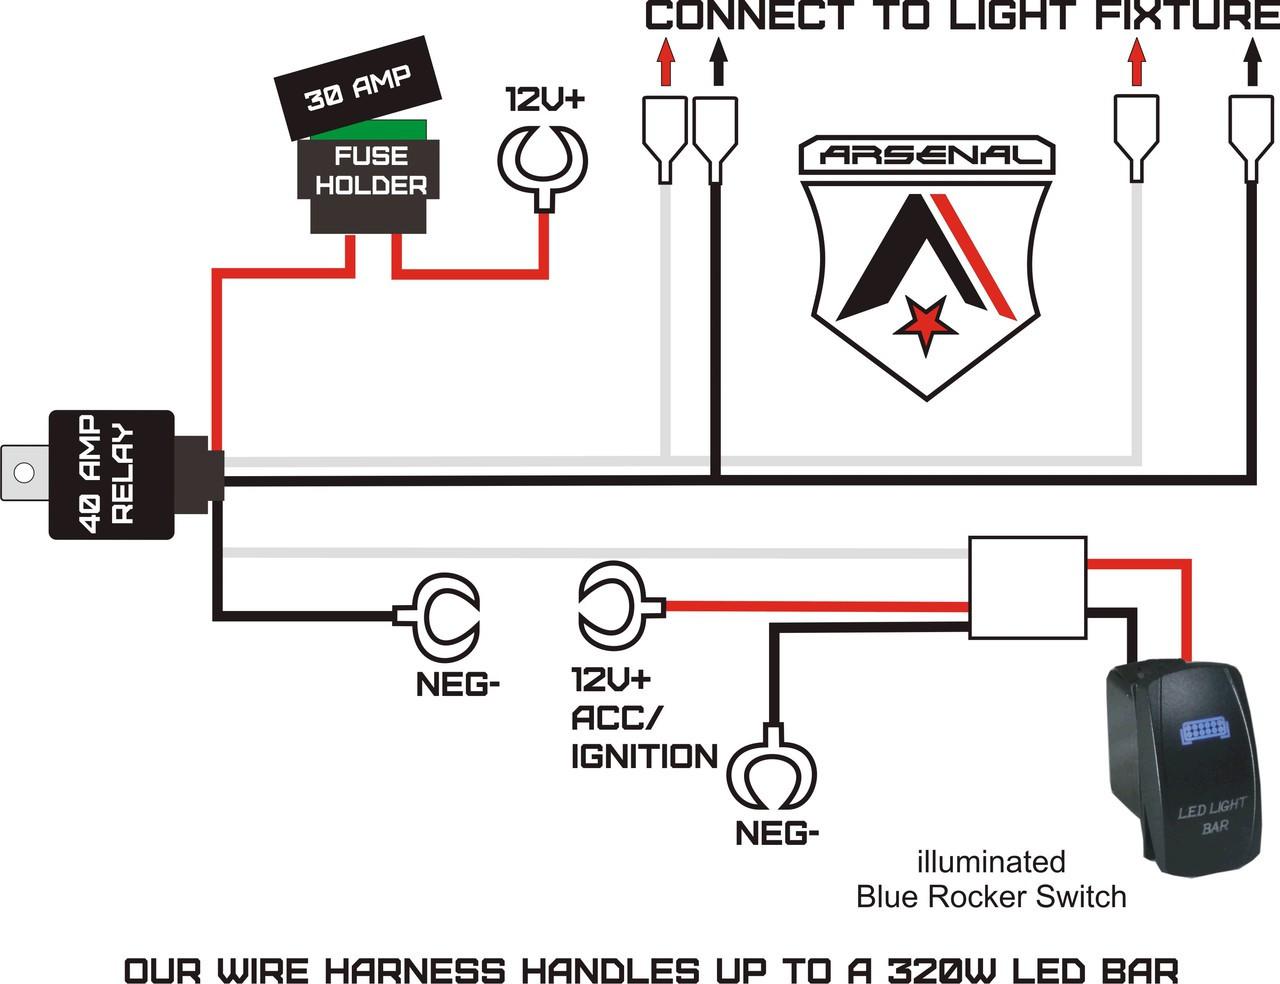 How To Wire Led Light Bar In Truck: #1 40 inch LED CREE Light Bar by Arsenal Offroad 228w Spot Flood Combo beam Offroad Trucks 4x4 JEEP Trucks UTV SUV 4x4 Polaris Razor 1000 Tractor rh:arsenal-offroad.com,Design